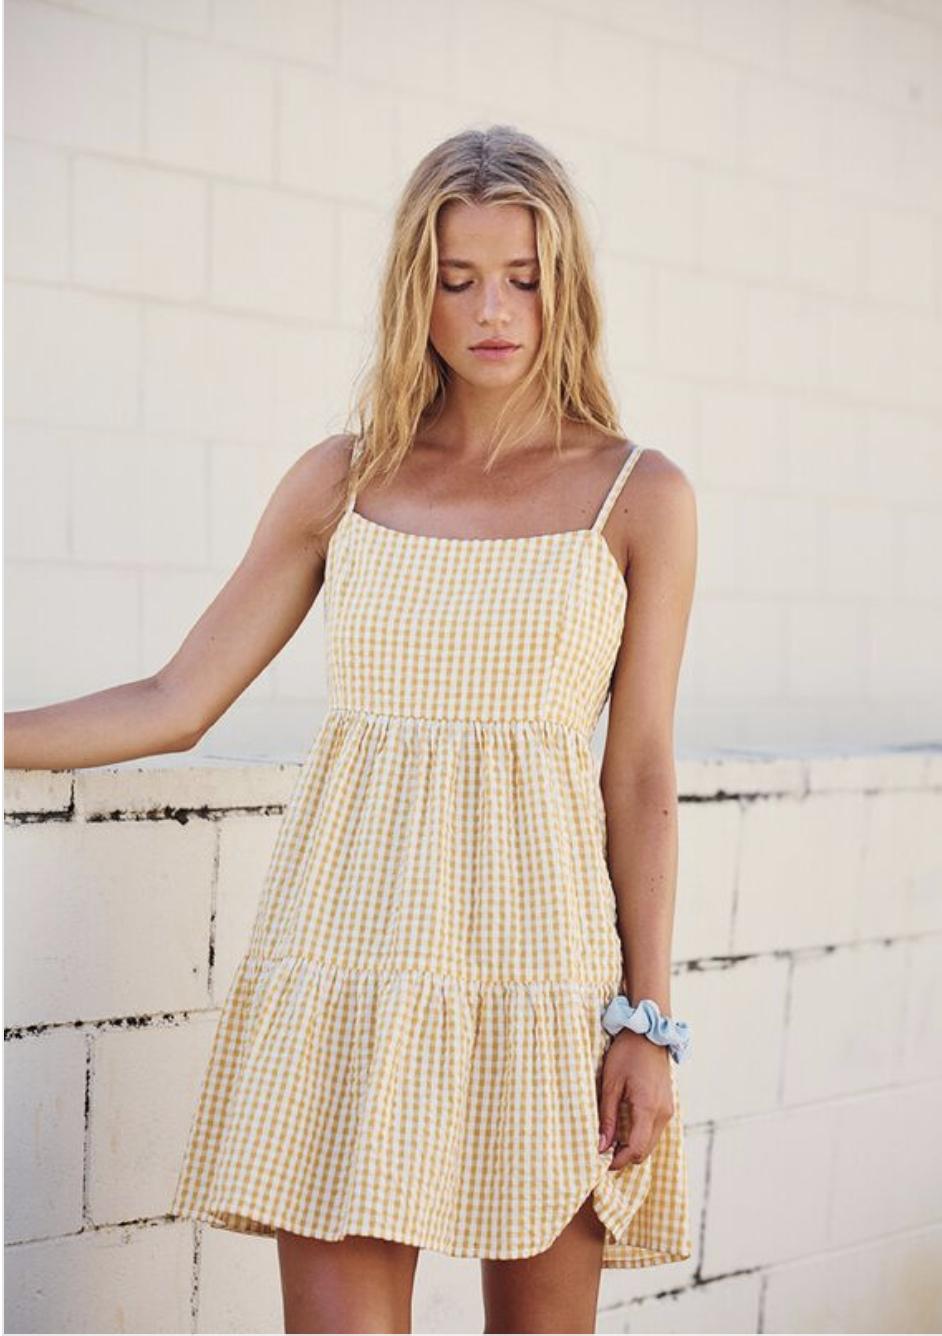 Woven Birdie Tiered Mini Dress Casual Summer Dresses Summer Dresses Cute Summer Dresses [ 1336 x 942 Pixel ]